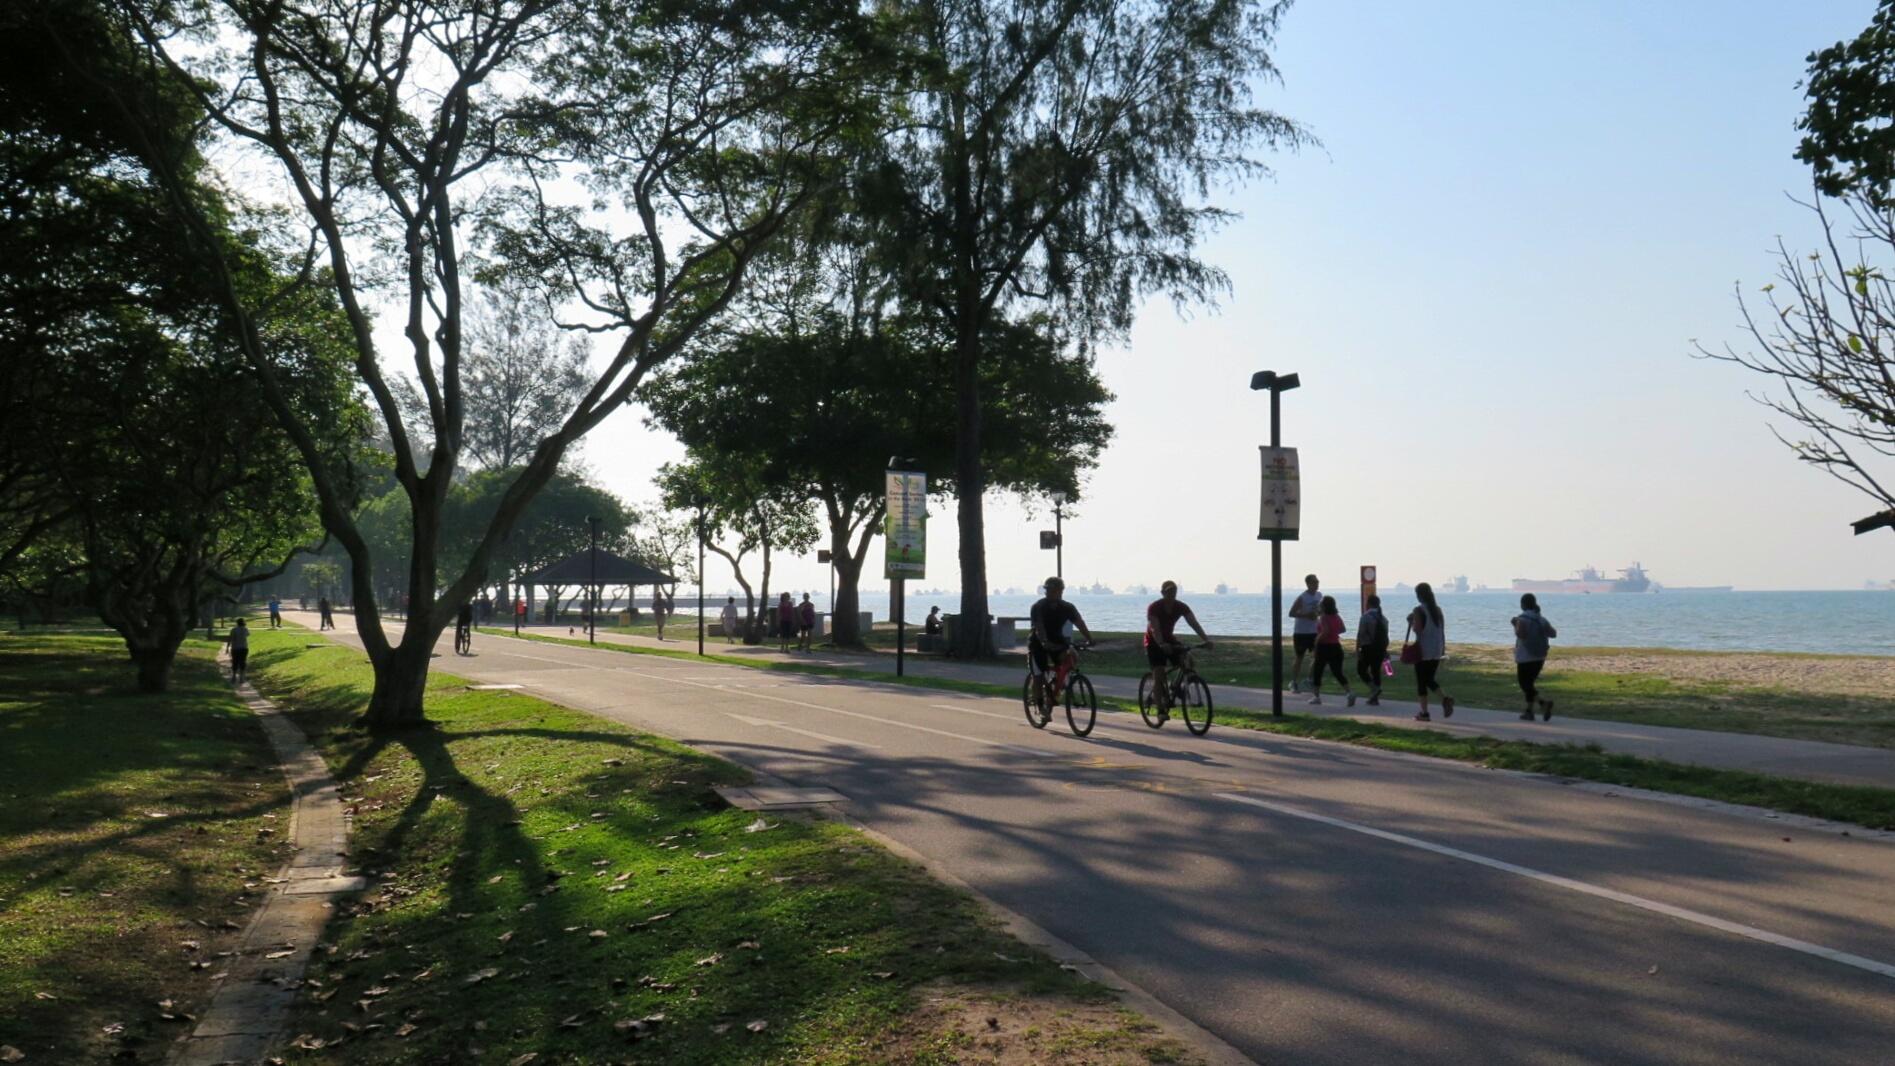 East Coast Park in Singapore | My Guide Singapore |East Coast Park Shelter